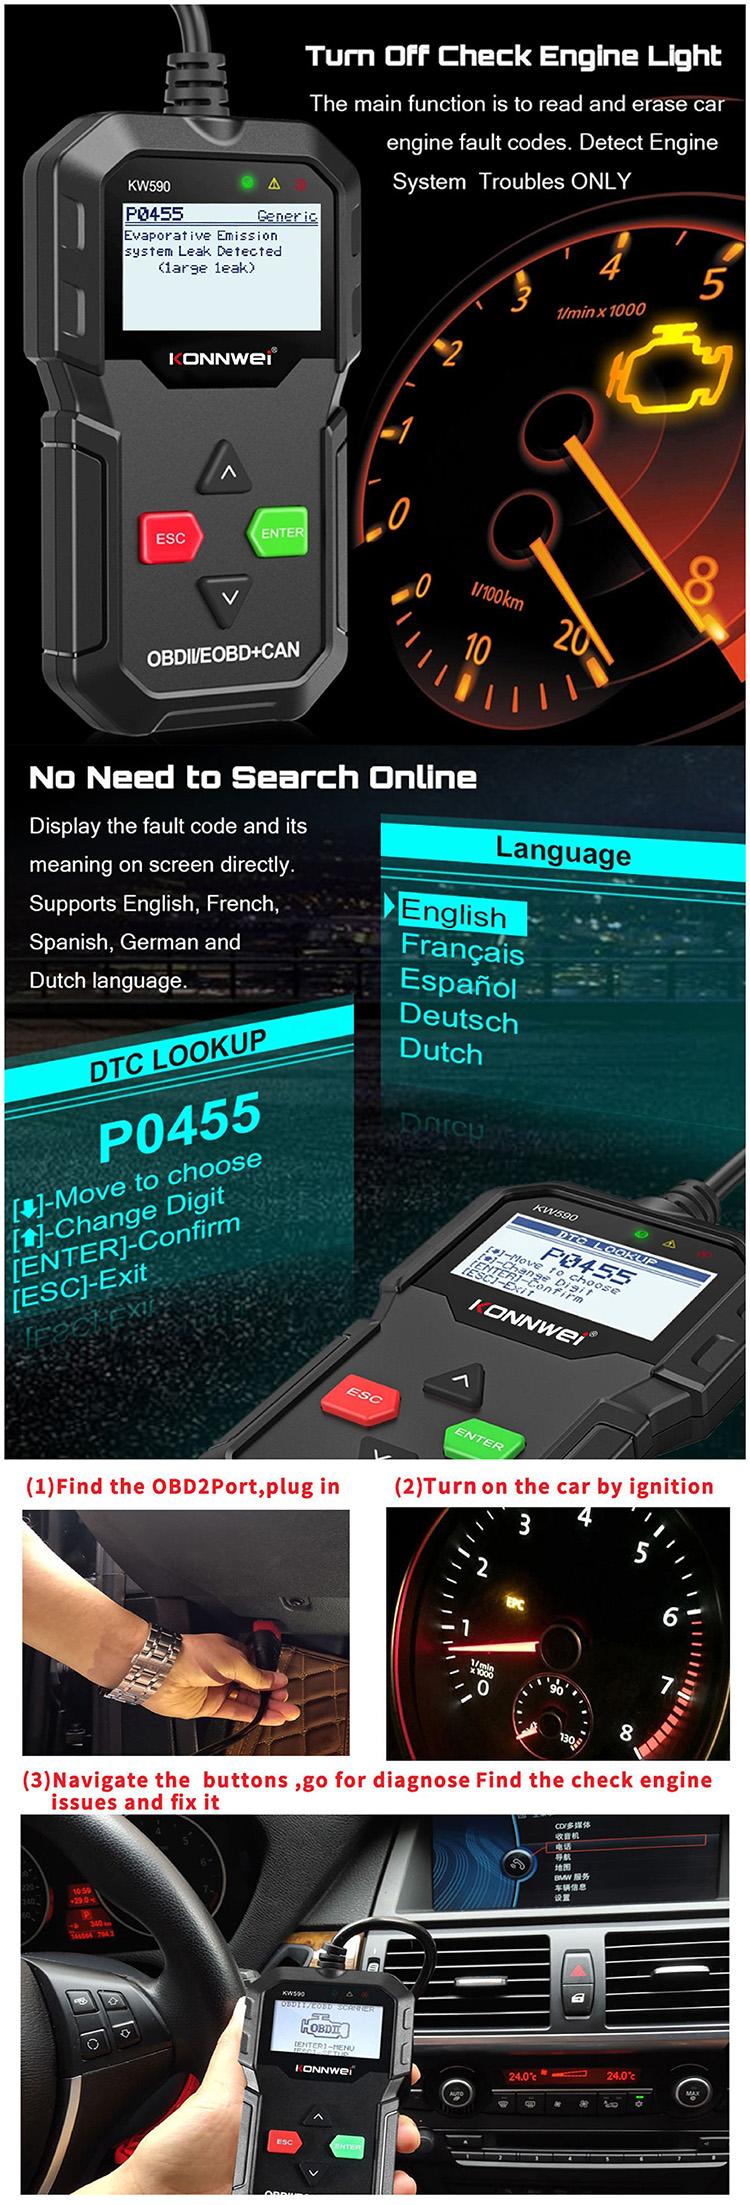 Car Diagnostic Machine Software Free Download Obd2 Gauge Car Scanning Ecu Obd2 Car Scanner Auto Diagnostic Tools Buy Diagnostic Tools Ecu Diagnostic Tools Car Scanner Diagnostic Tools Product On Alibaba Com